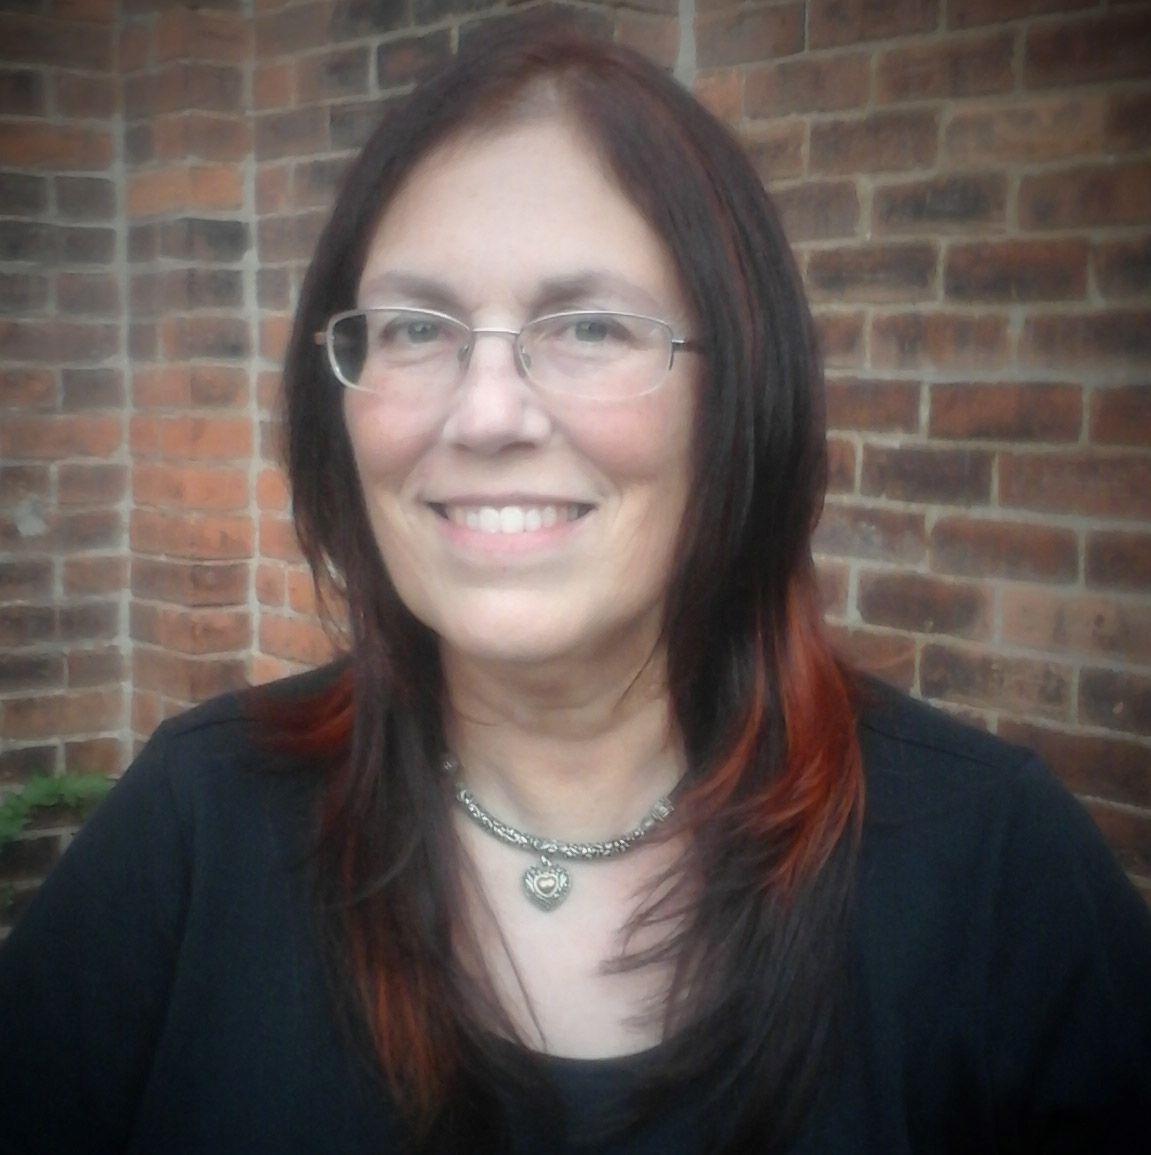 picture Suzanne Krull